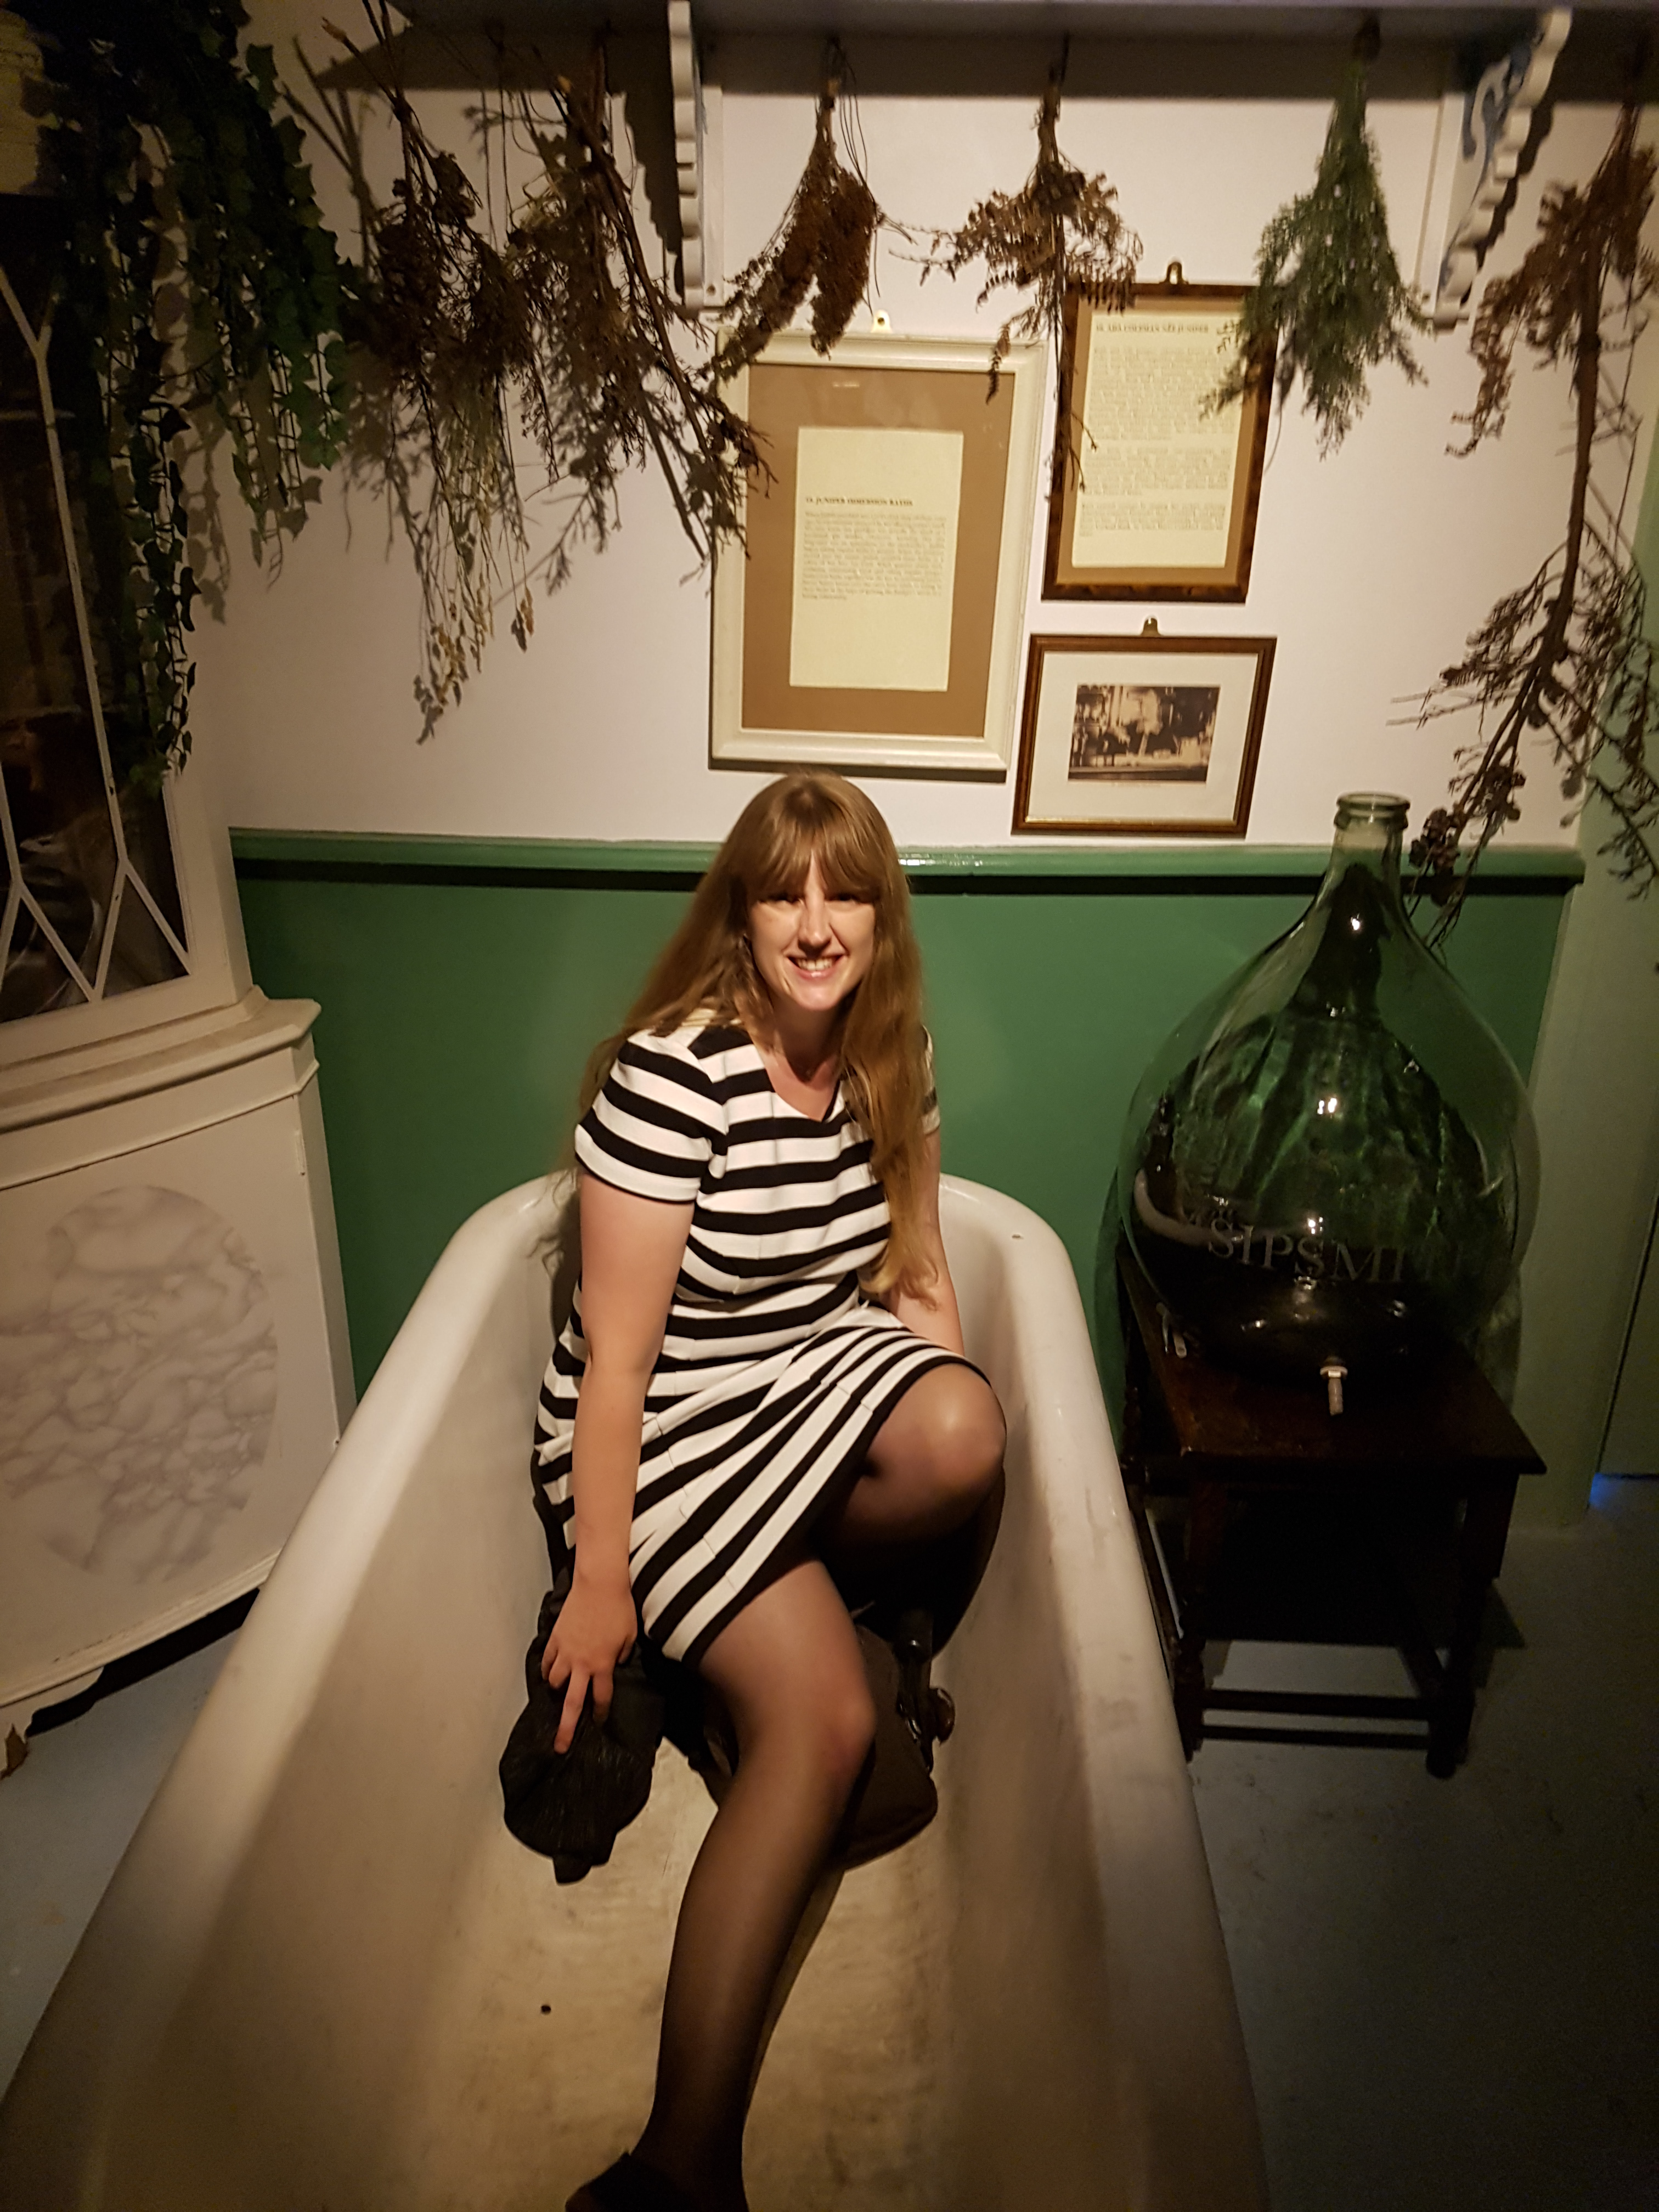 Gingerline me in bathtub